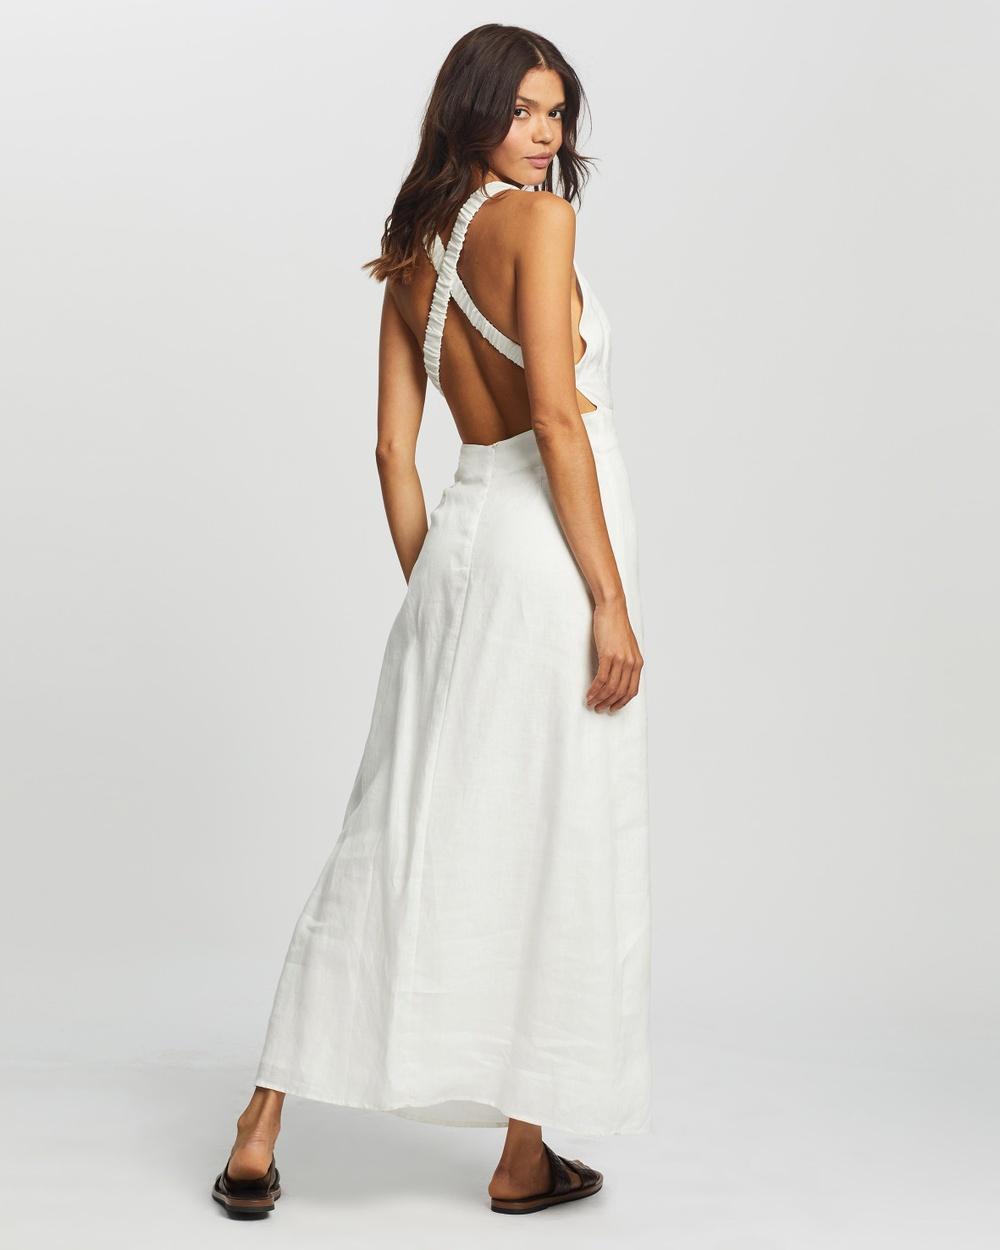 AERE Cross Back Maxi Dresses Ivory Australia